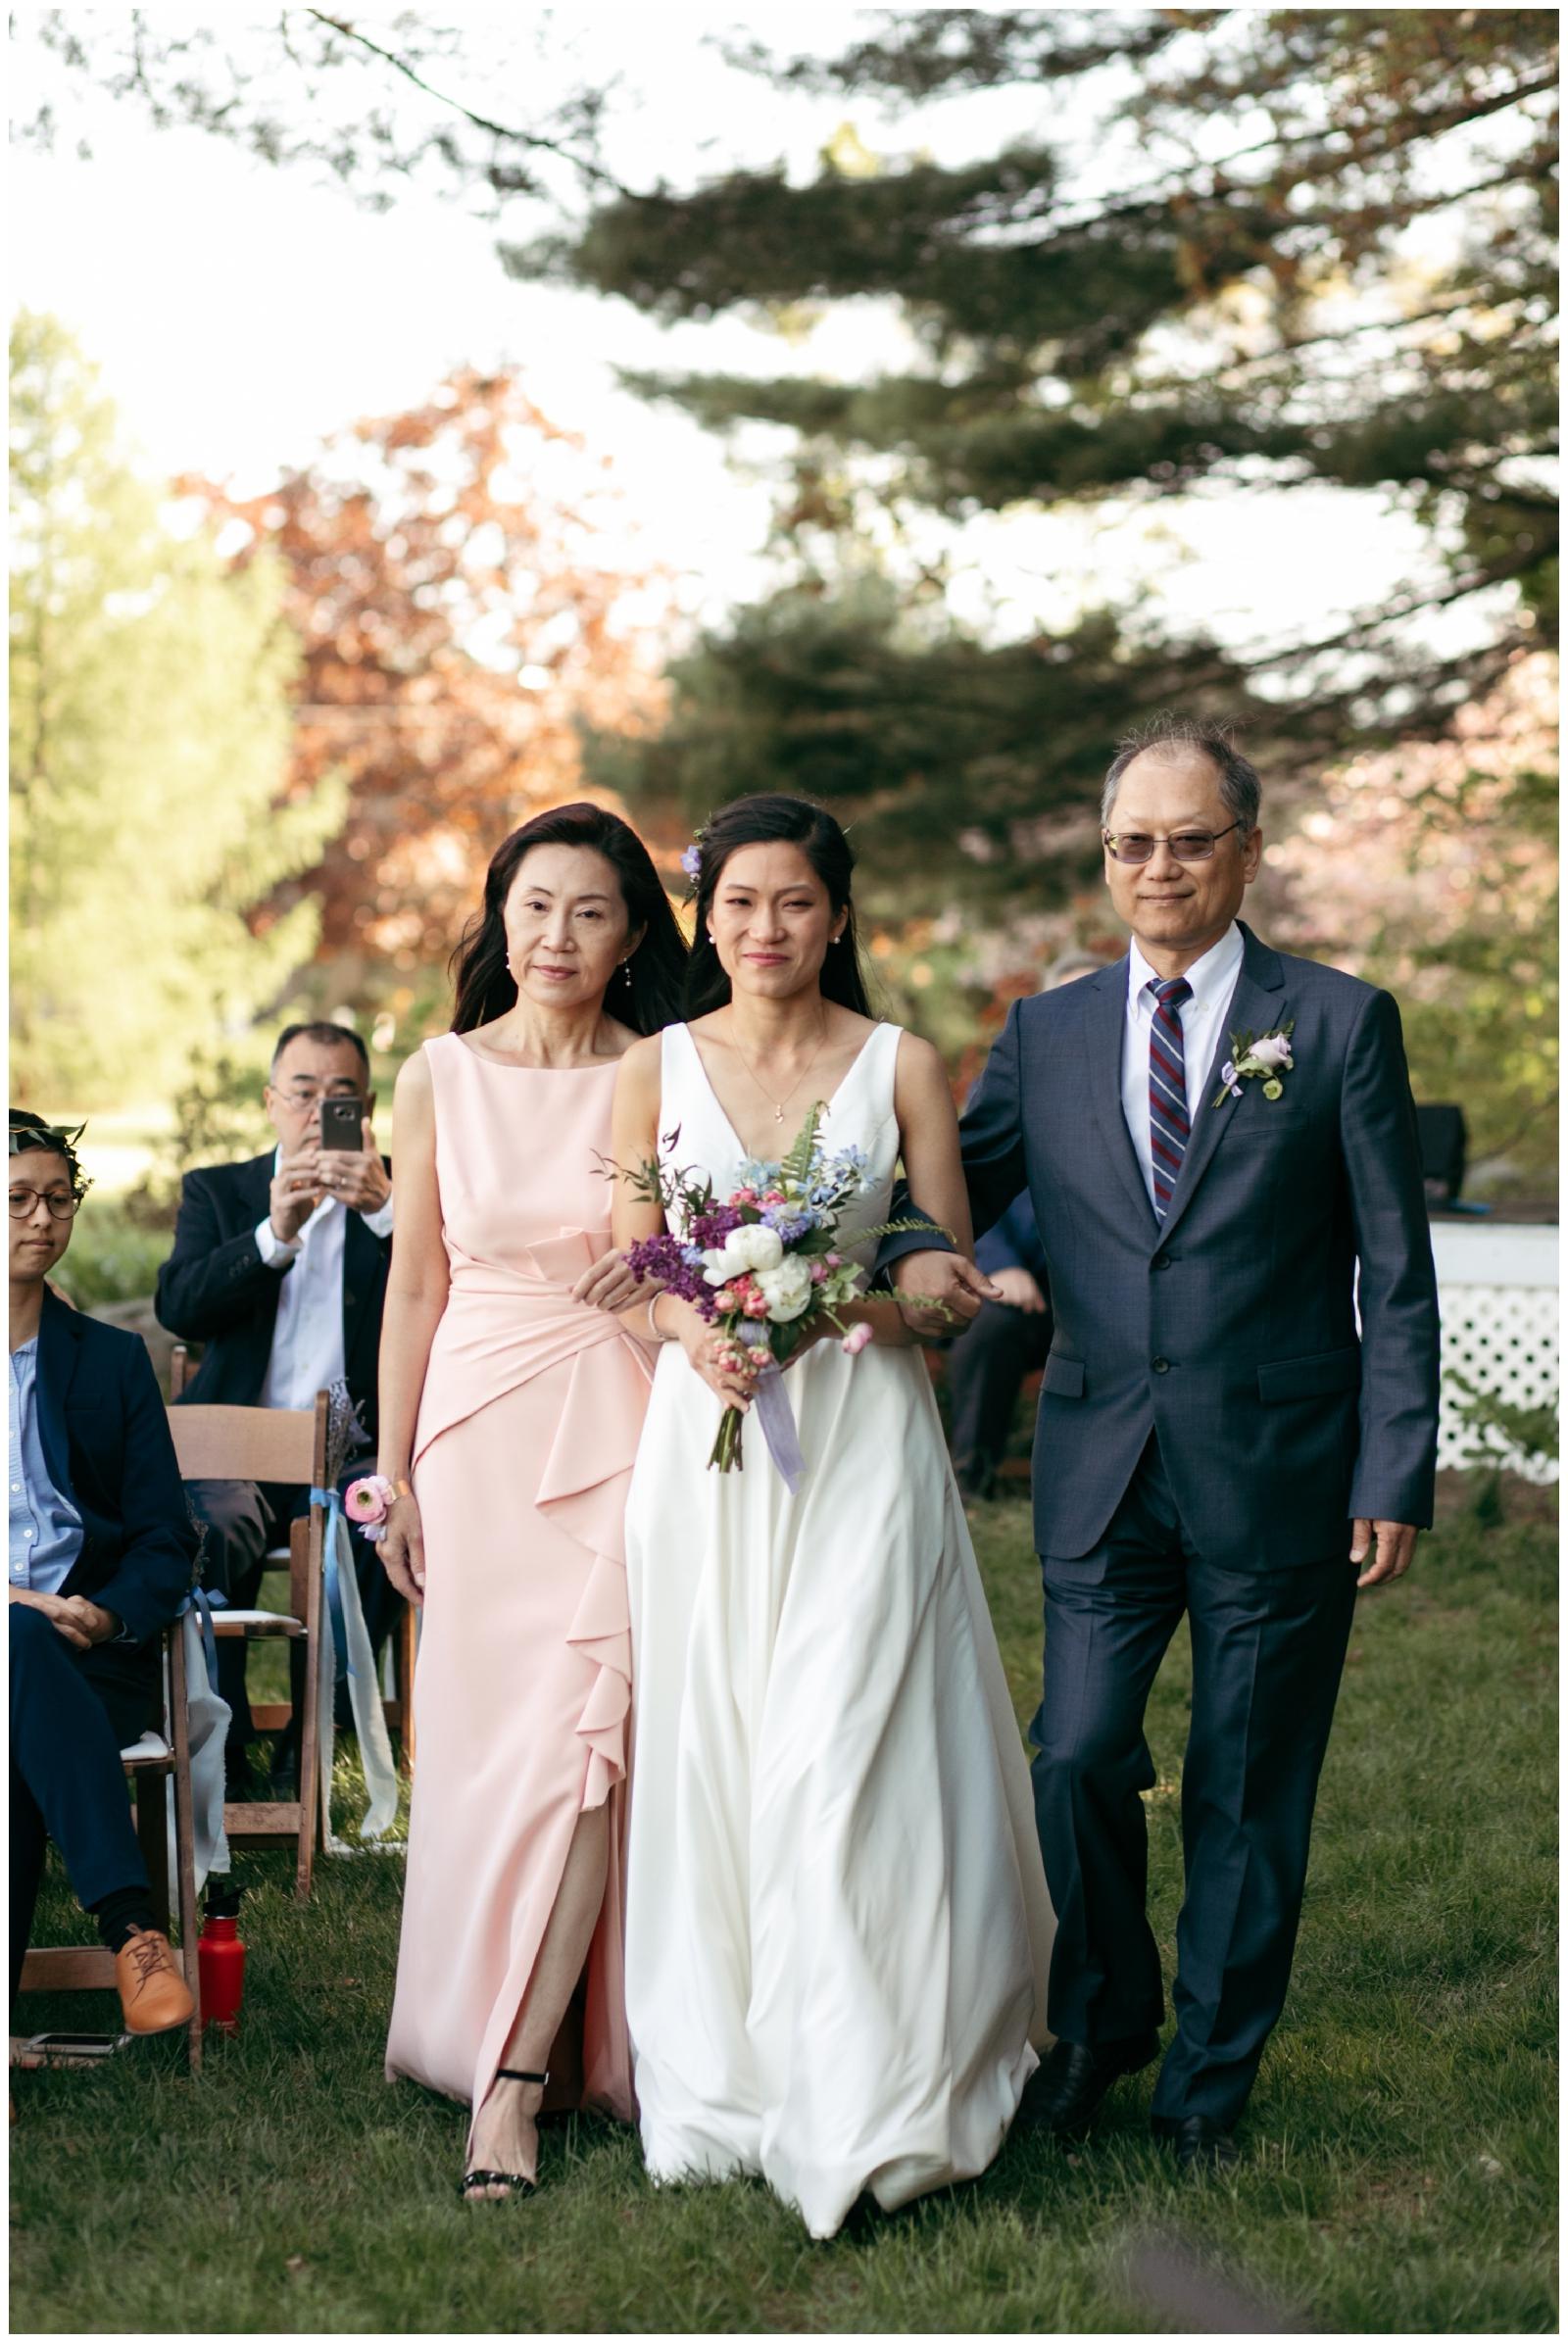 outdoor wedding location near Boston